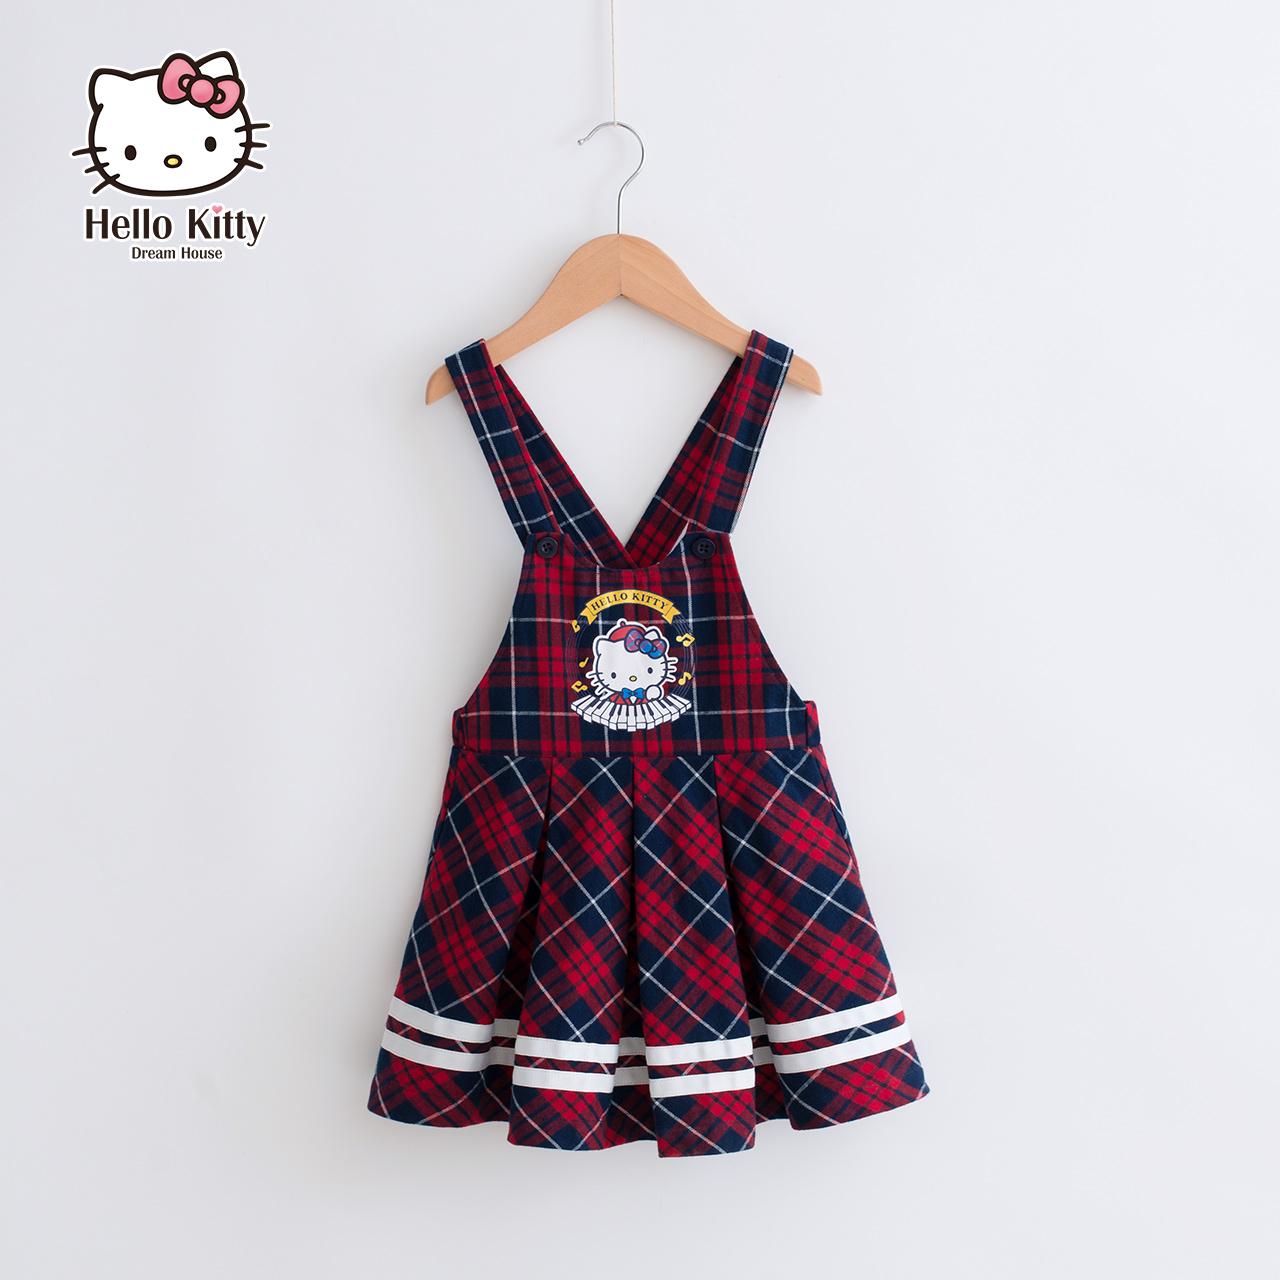 Hello kitty童装女童连衣裙秋装2018新款吊带裙子儿童公主背带裙